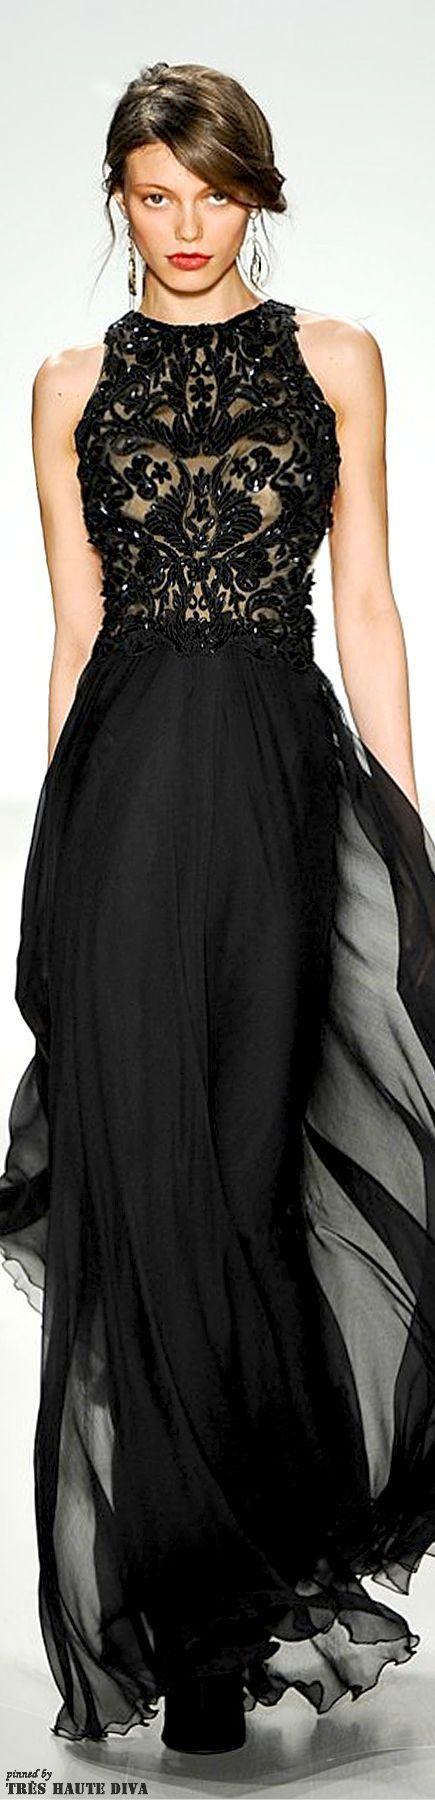 Tadashi Shoji Fall/Winter 2014 RTW black lace evening gown via: jaglady